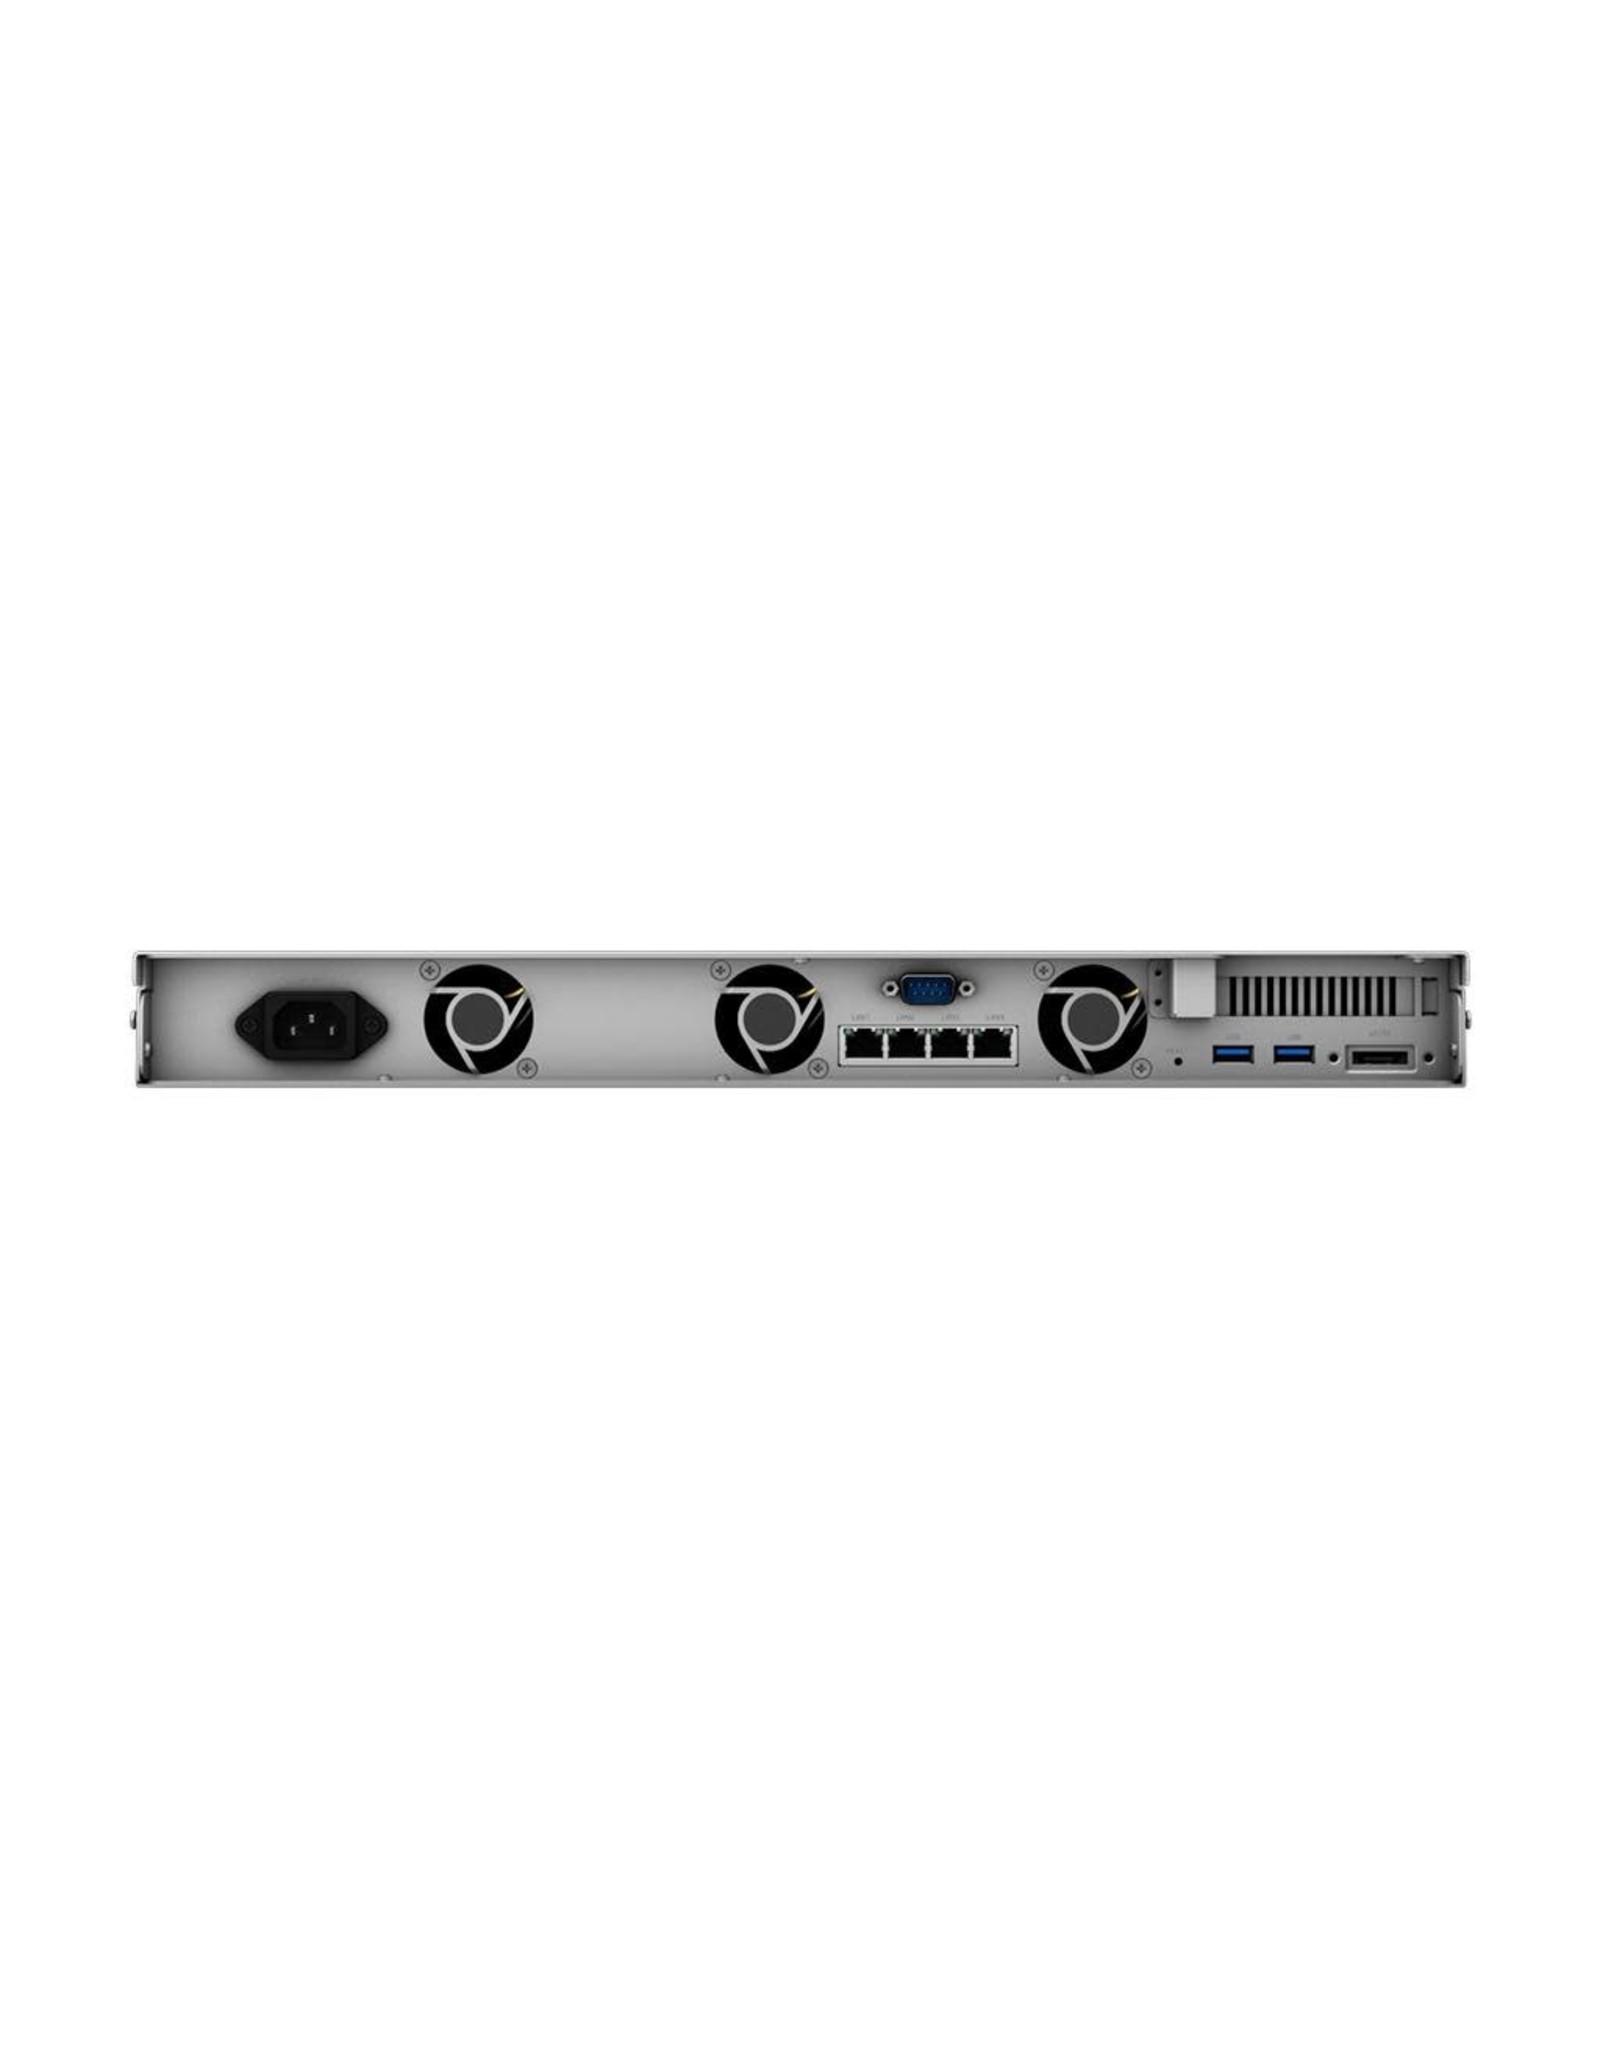 Synology Synology RS818+ 24TB 4-Bay 1RU High Performance 2.4GHz Quadcore NAS Server (4x6TB Value Enterprise HDD 5YR)